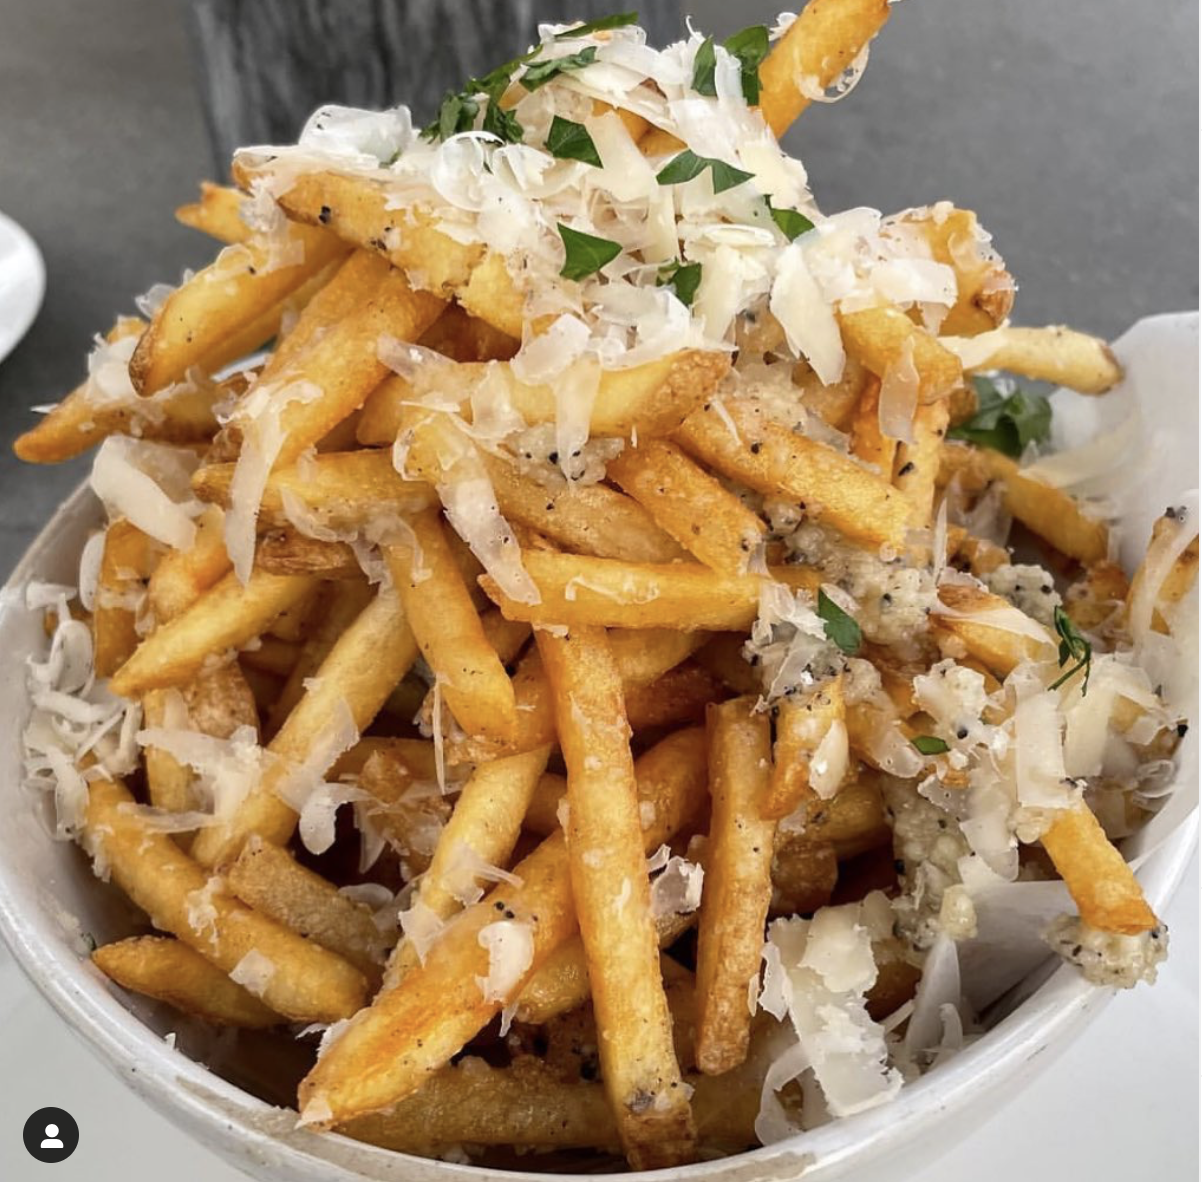 @nyc.food | instagram